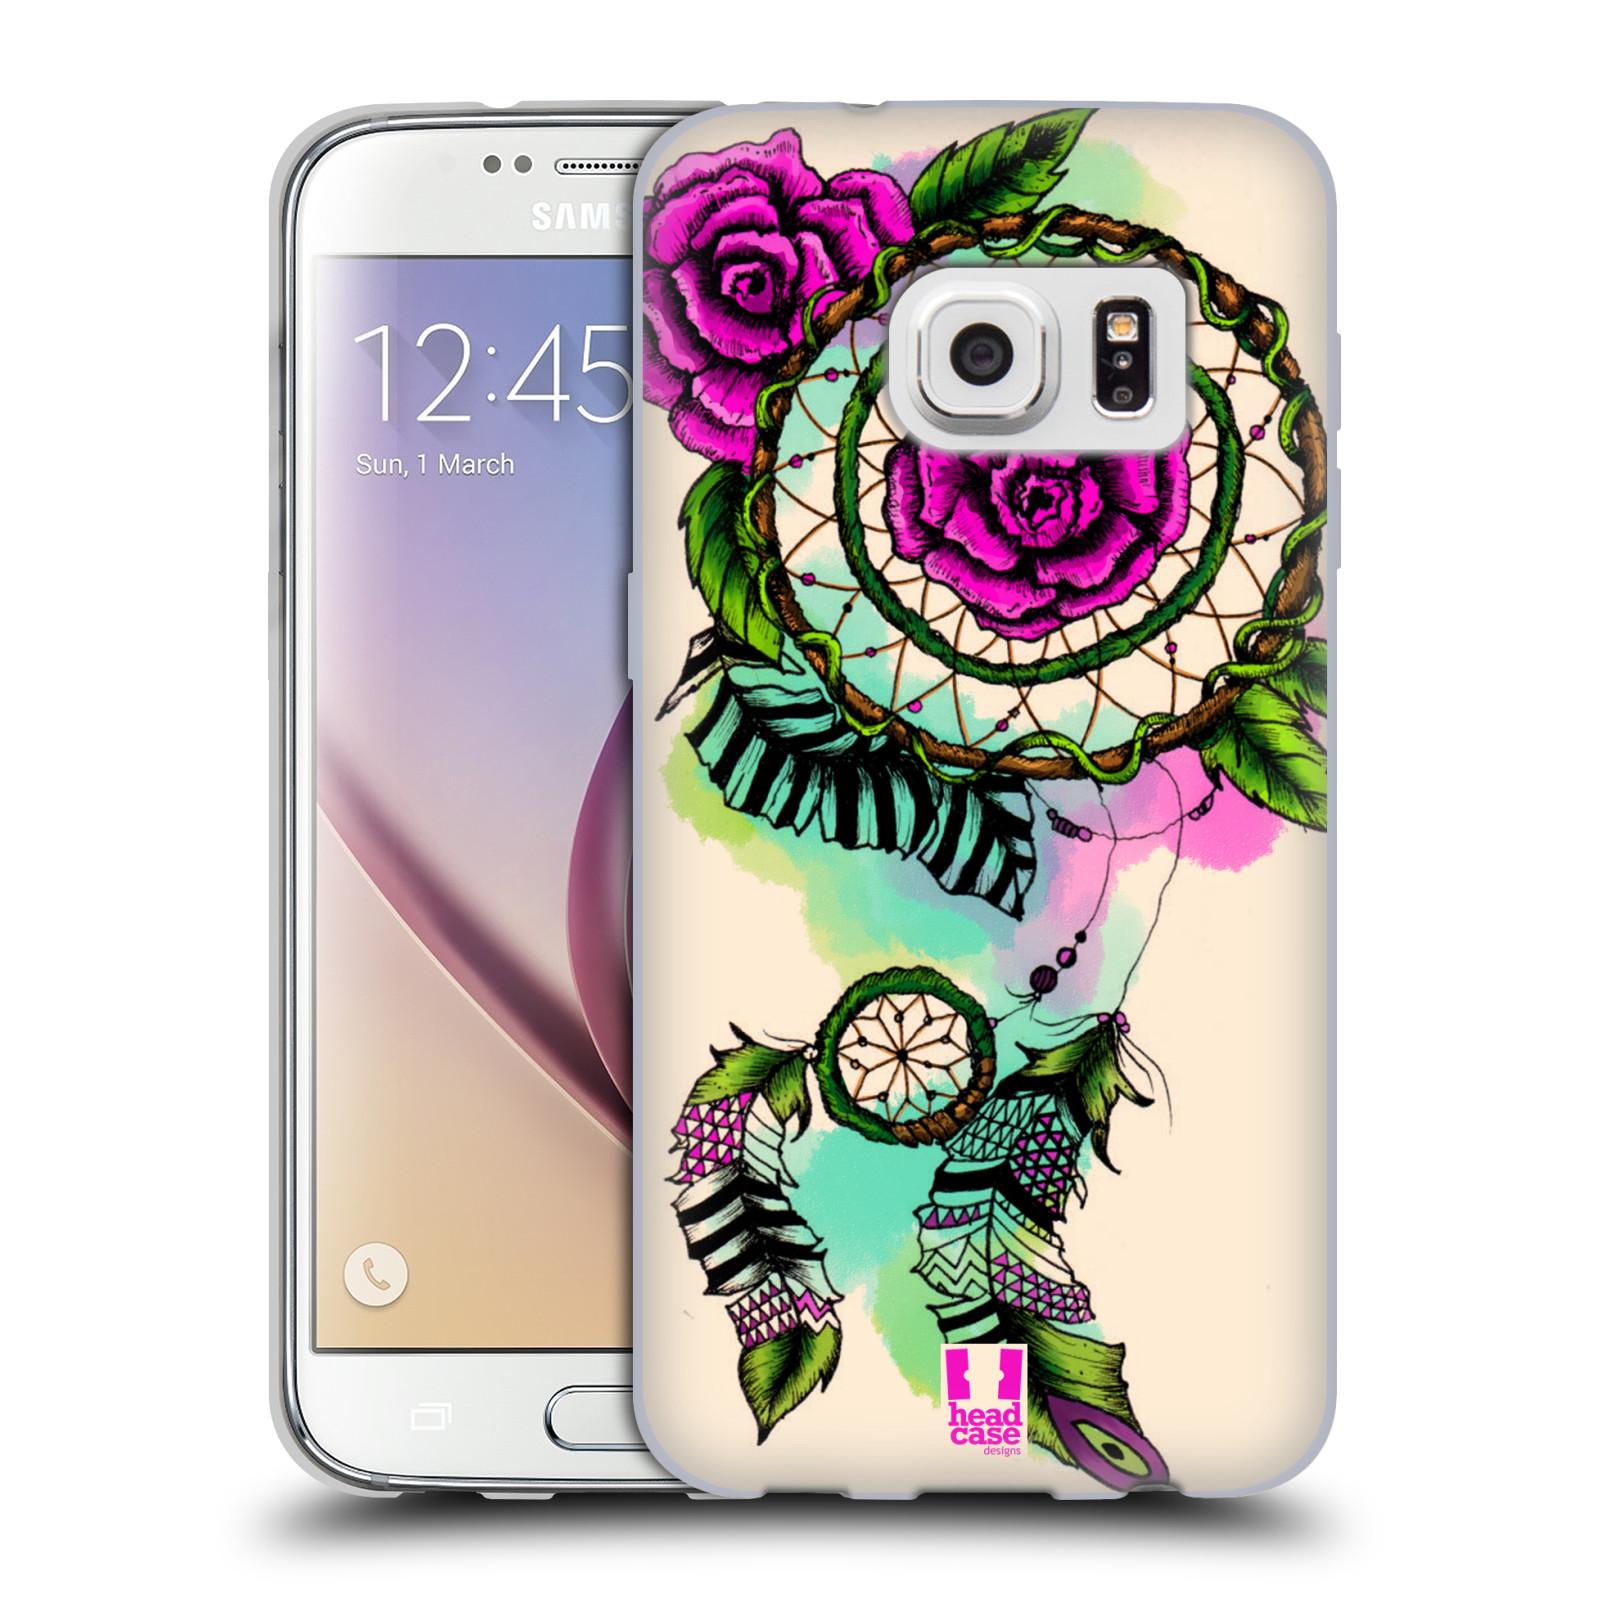 HEAD CASE silikonový obal na mobil Samsung Galaxy S7 vzor Květy lapač snů růže